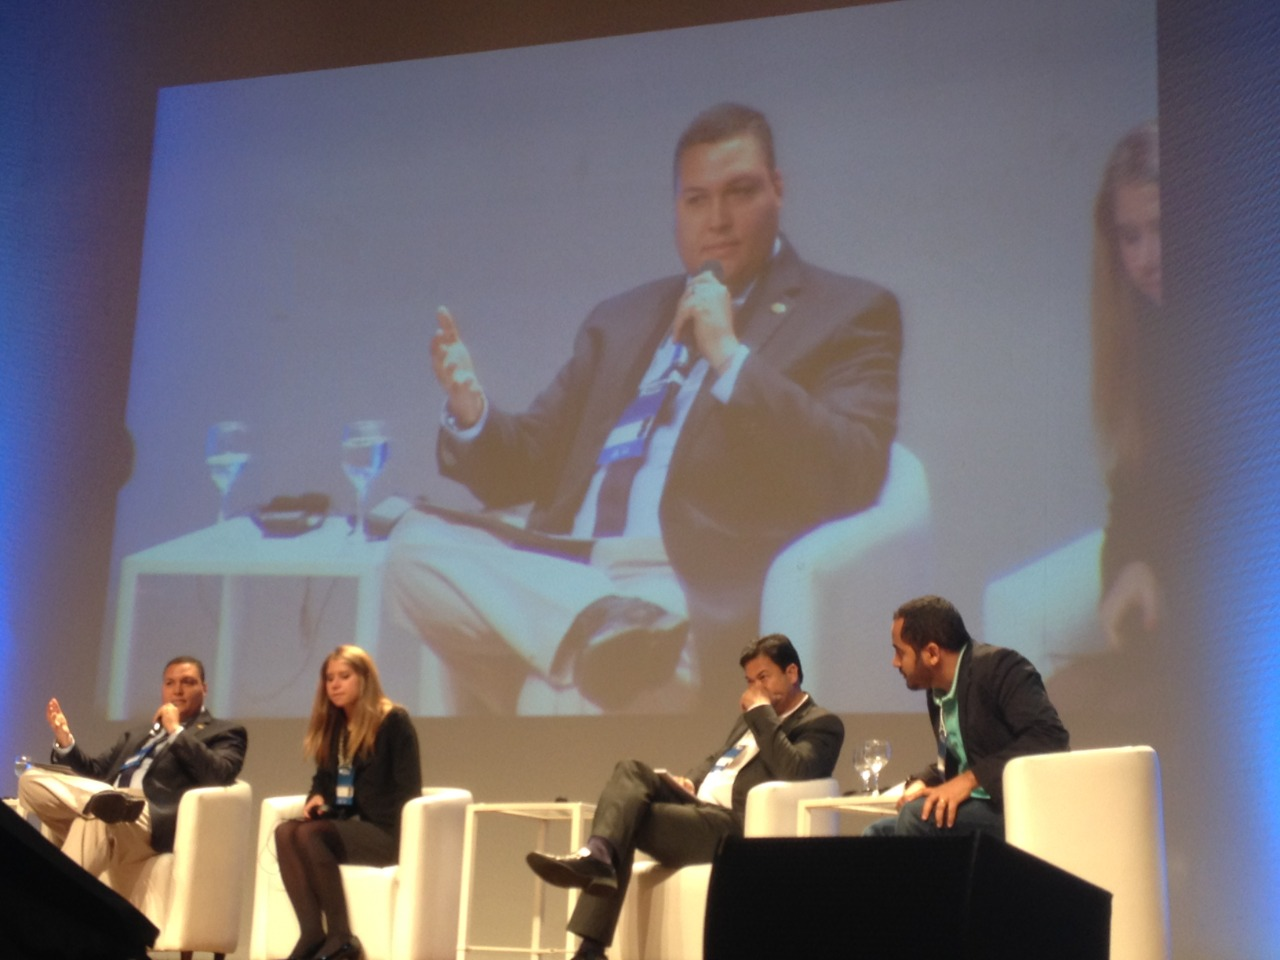 Fórum Internacional de TI Banrisul